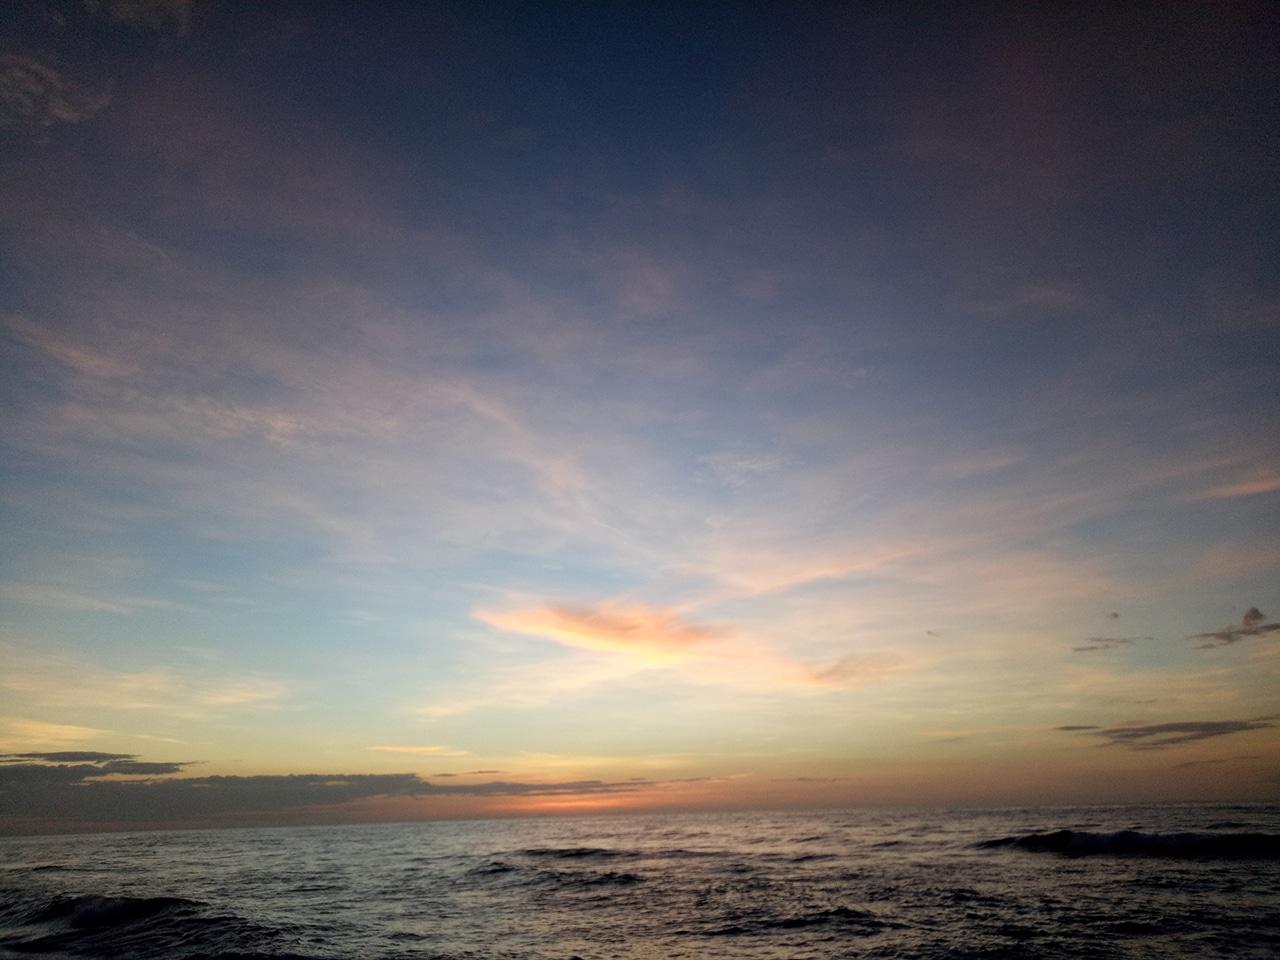 oppo-f1s-sample-sunset-photo